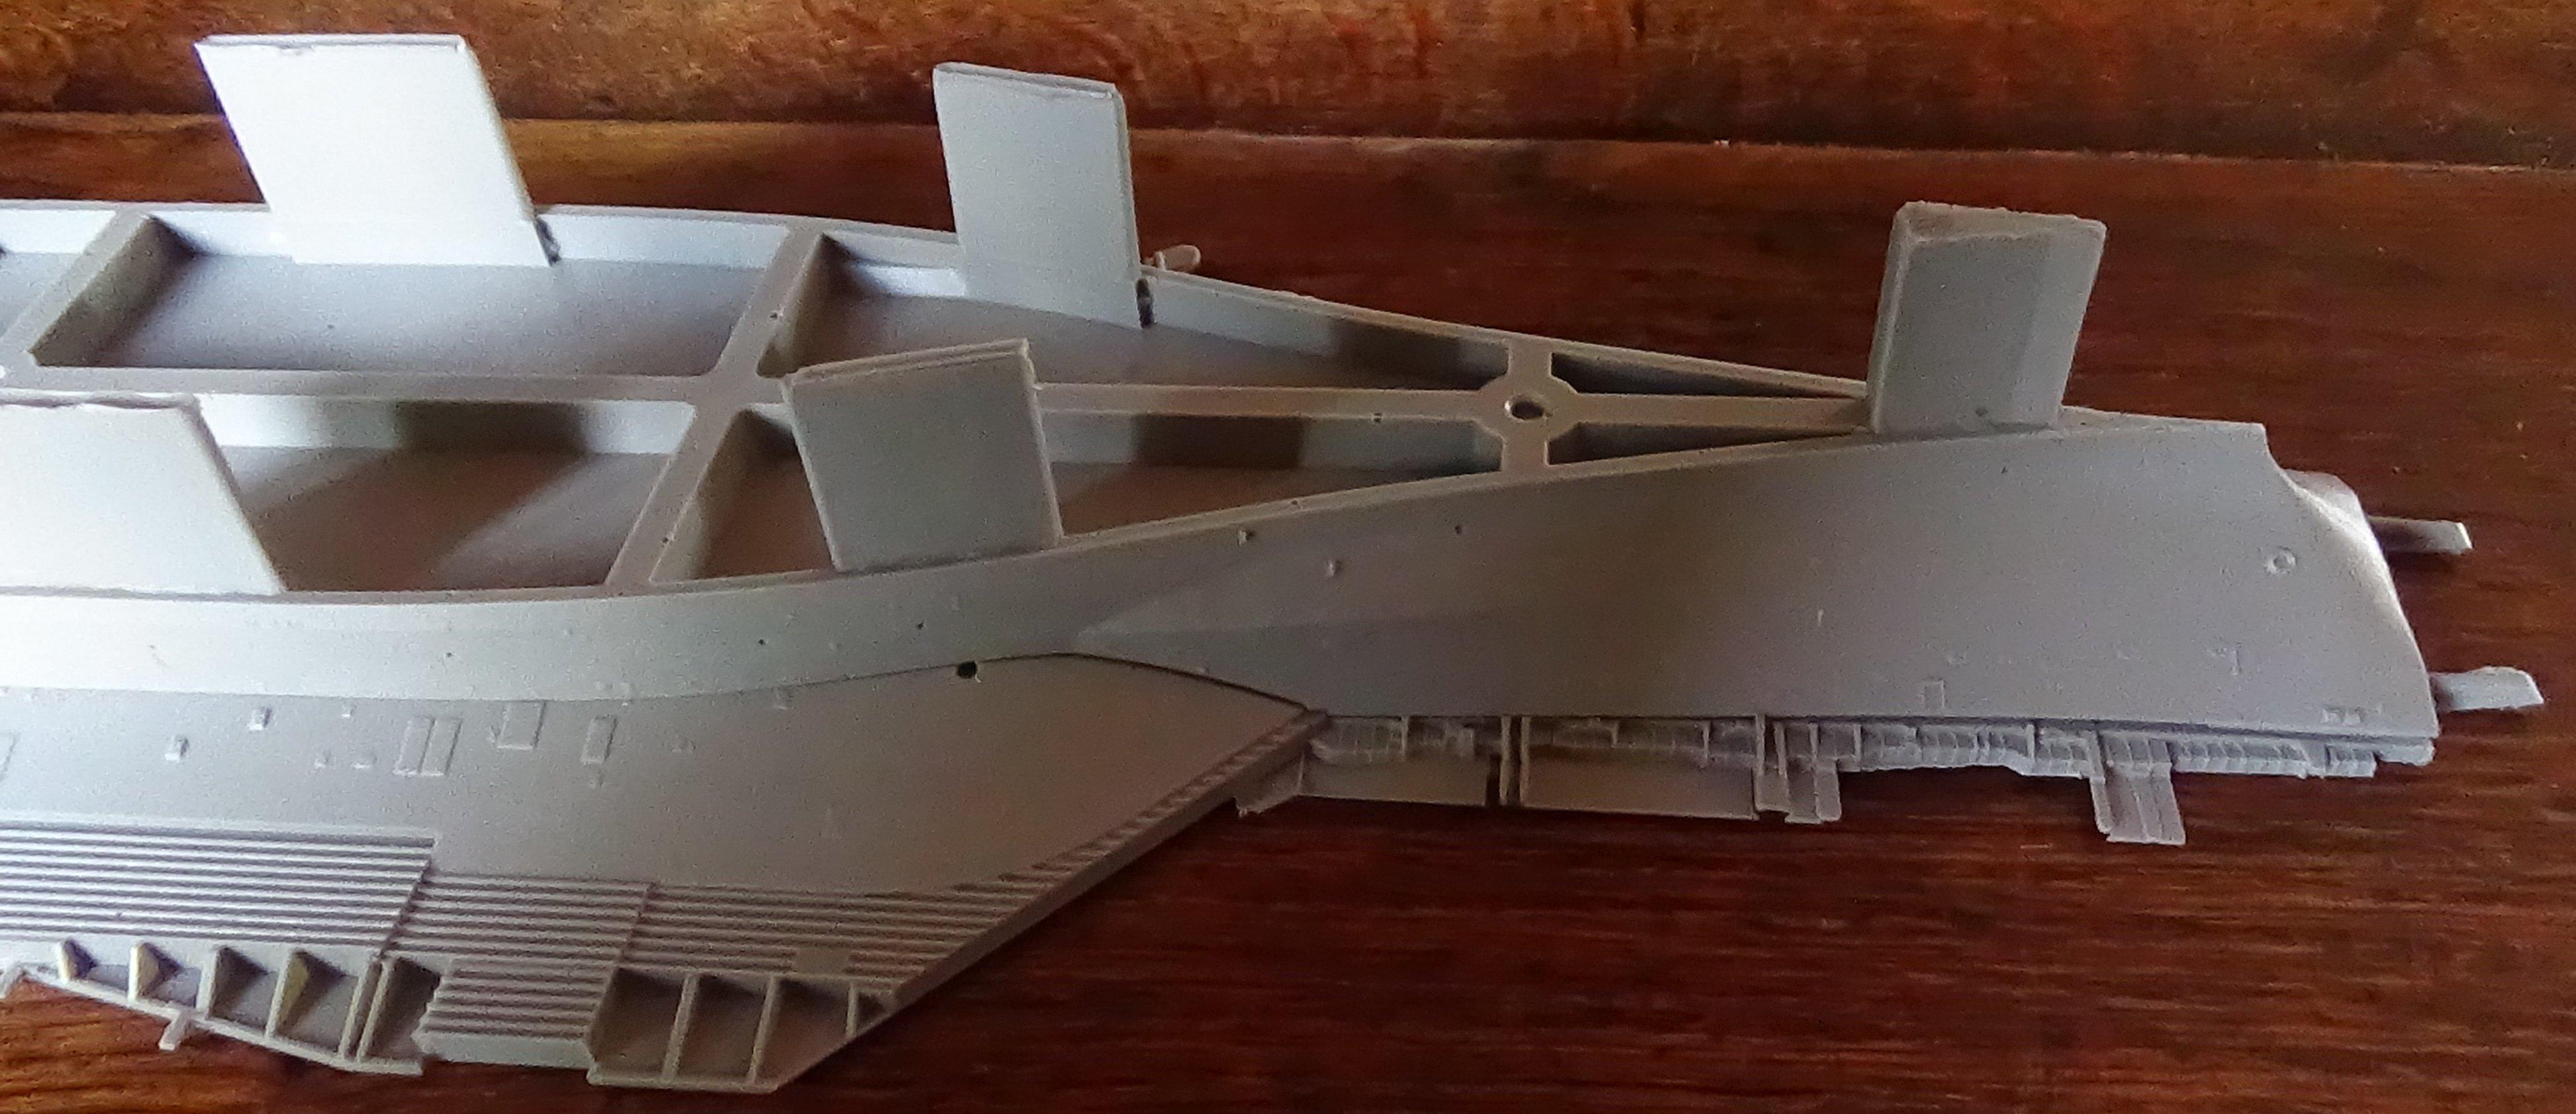 [USS Midway CVA-41] Porte avions lourd américain-700e-Orange Hobby 17071905024023134915155988